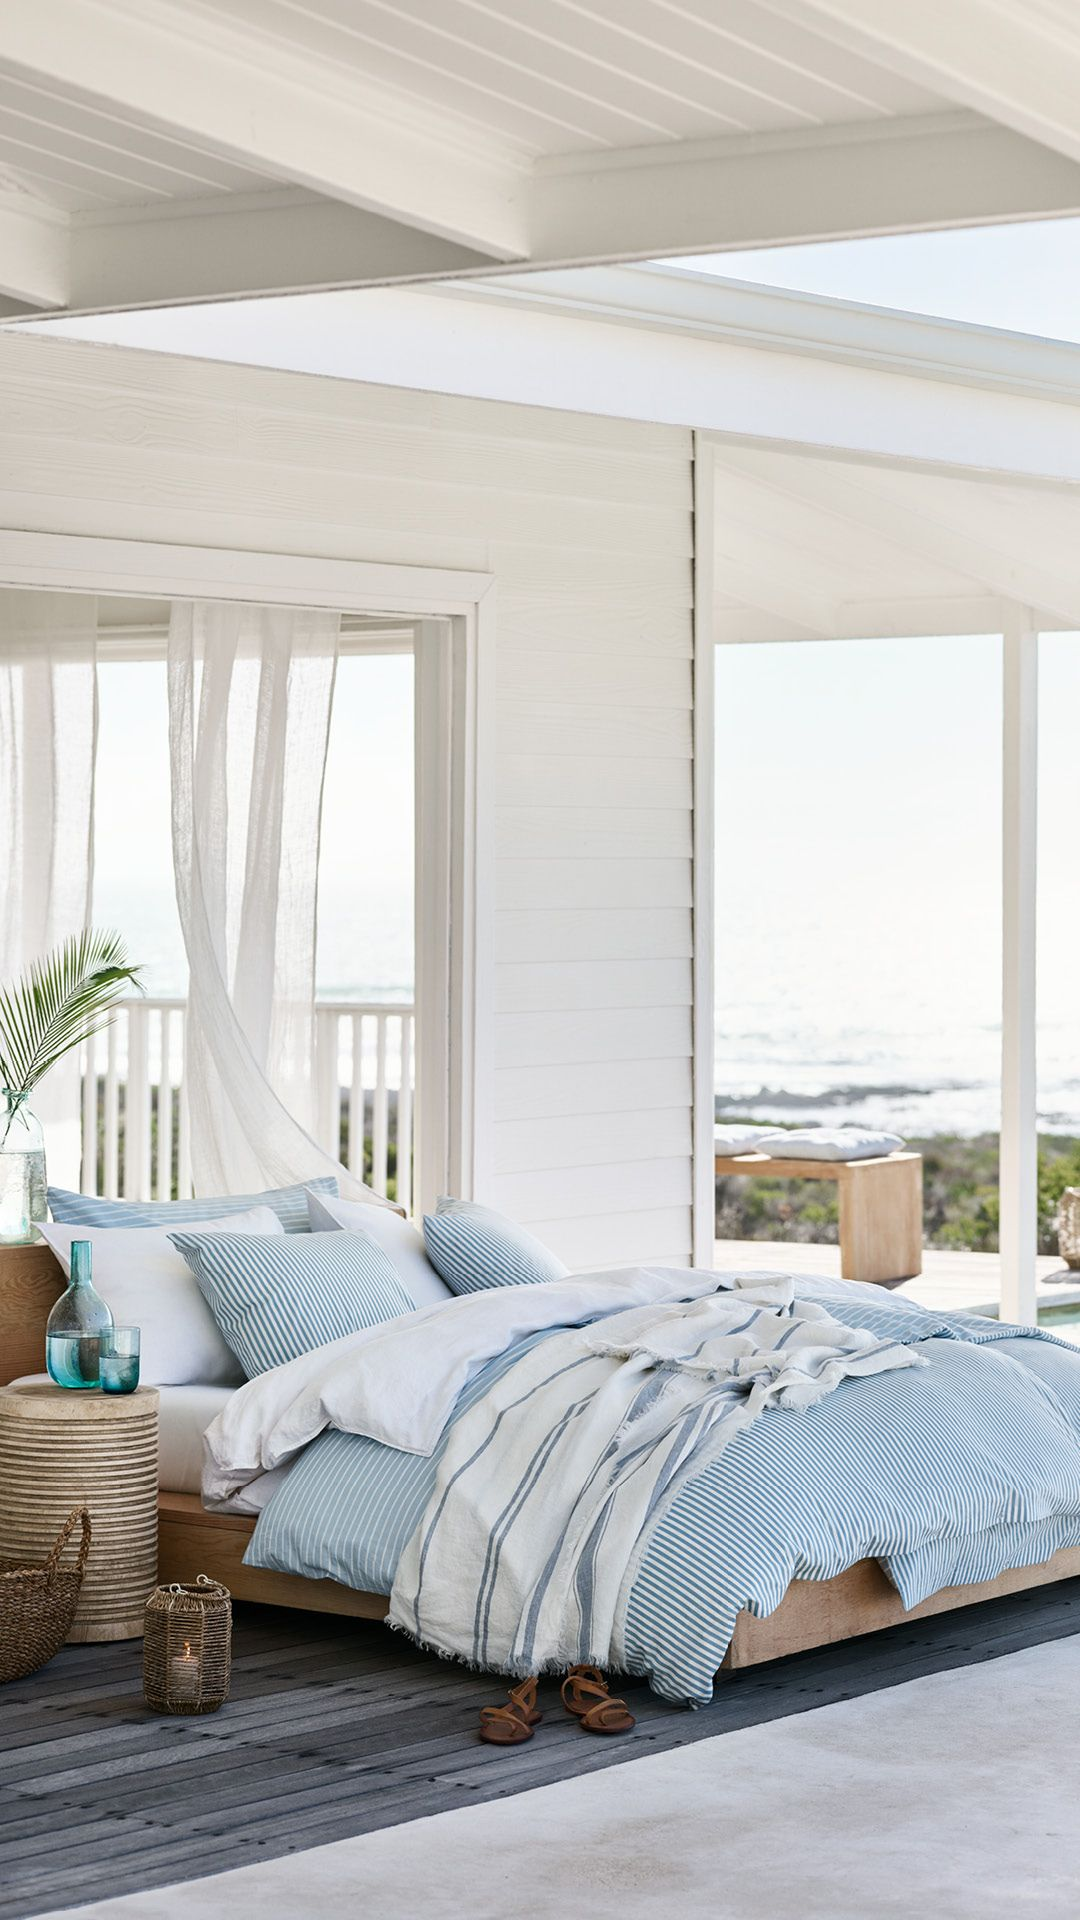 H M Home Cool Touch Bed Linen And Soft Pillows In Ice Blue Shades Discover Our Dreamy Bedroo Slaapkamer Verbouwen Zomer Slaapkamer Een Slaapkamer Inrichten